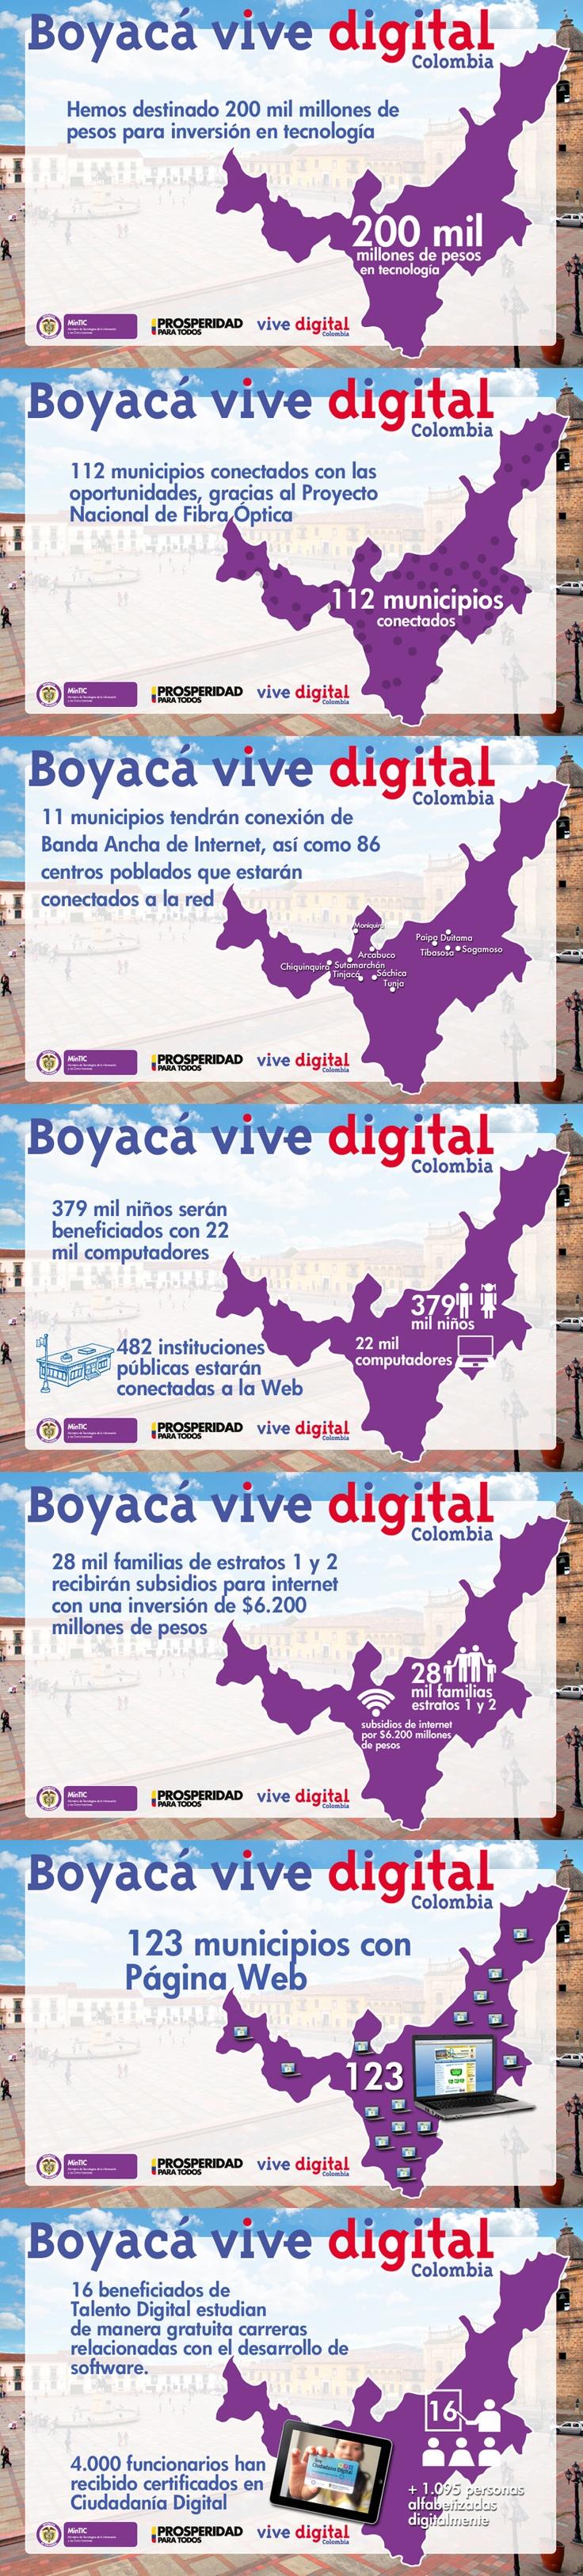 Boyacá Vive Digital